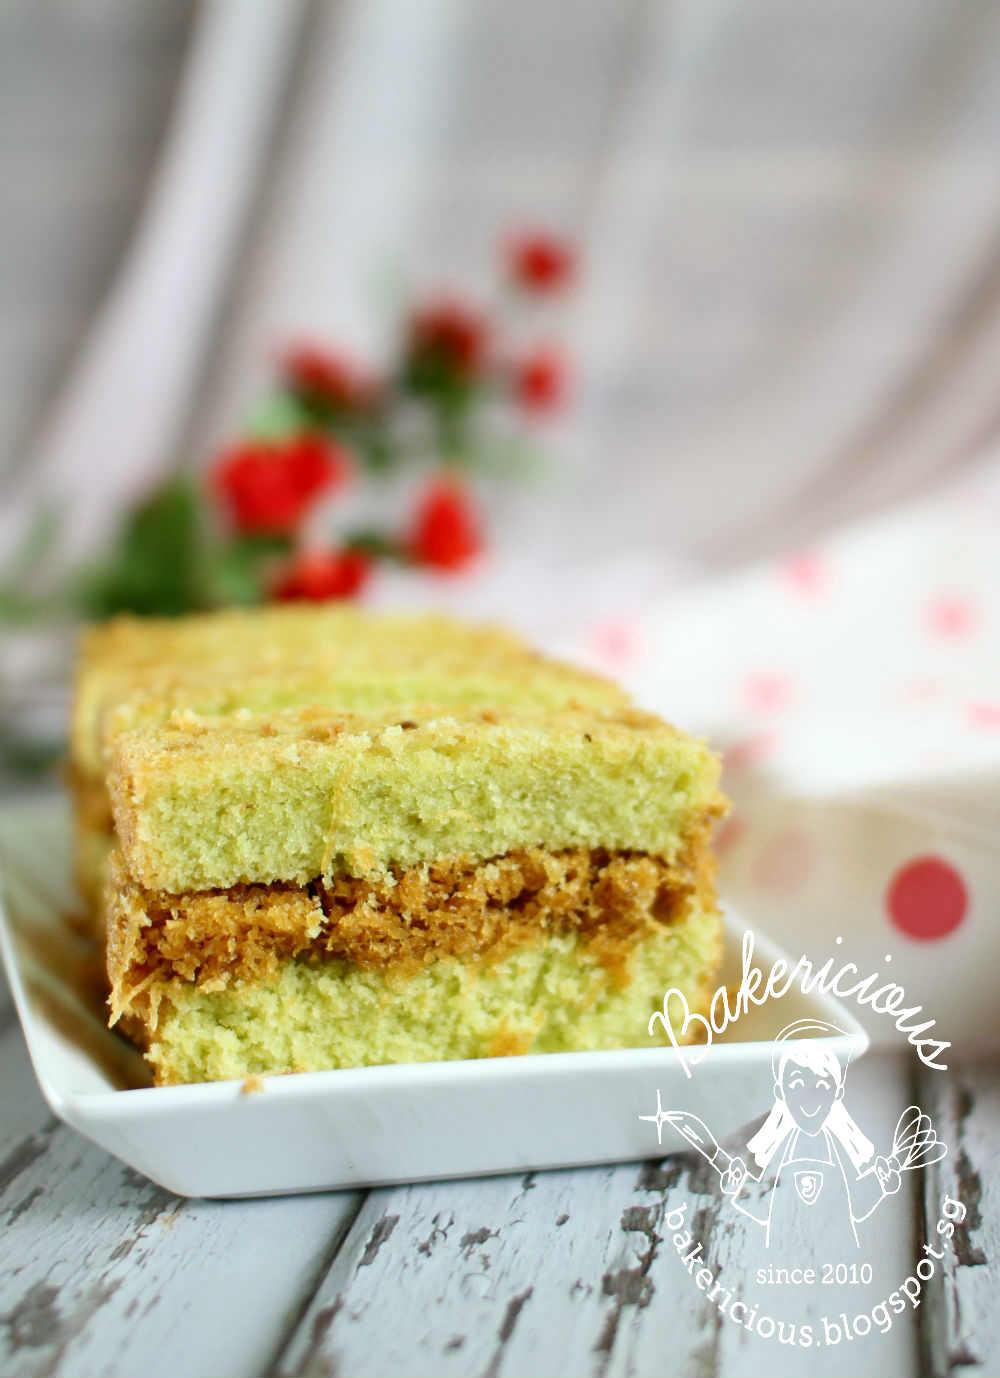 Bakericious: Pandan Butter Cake with Gula Melaka Filling